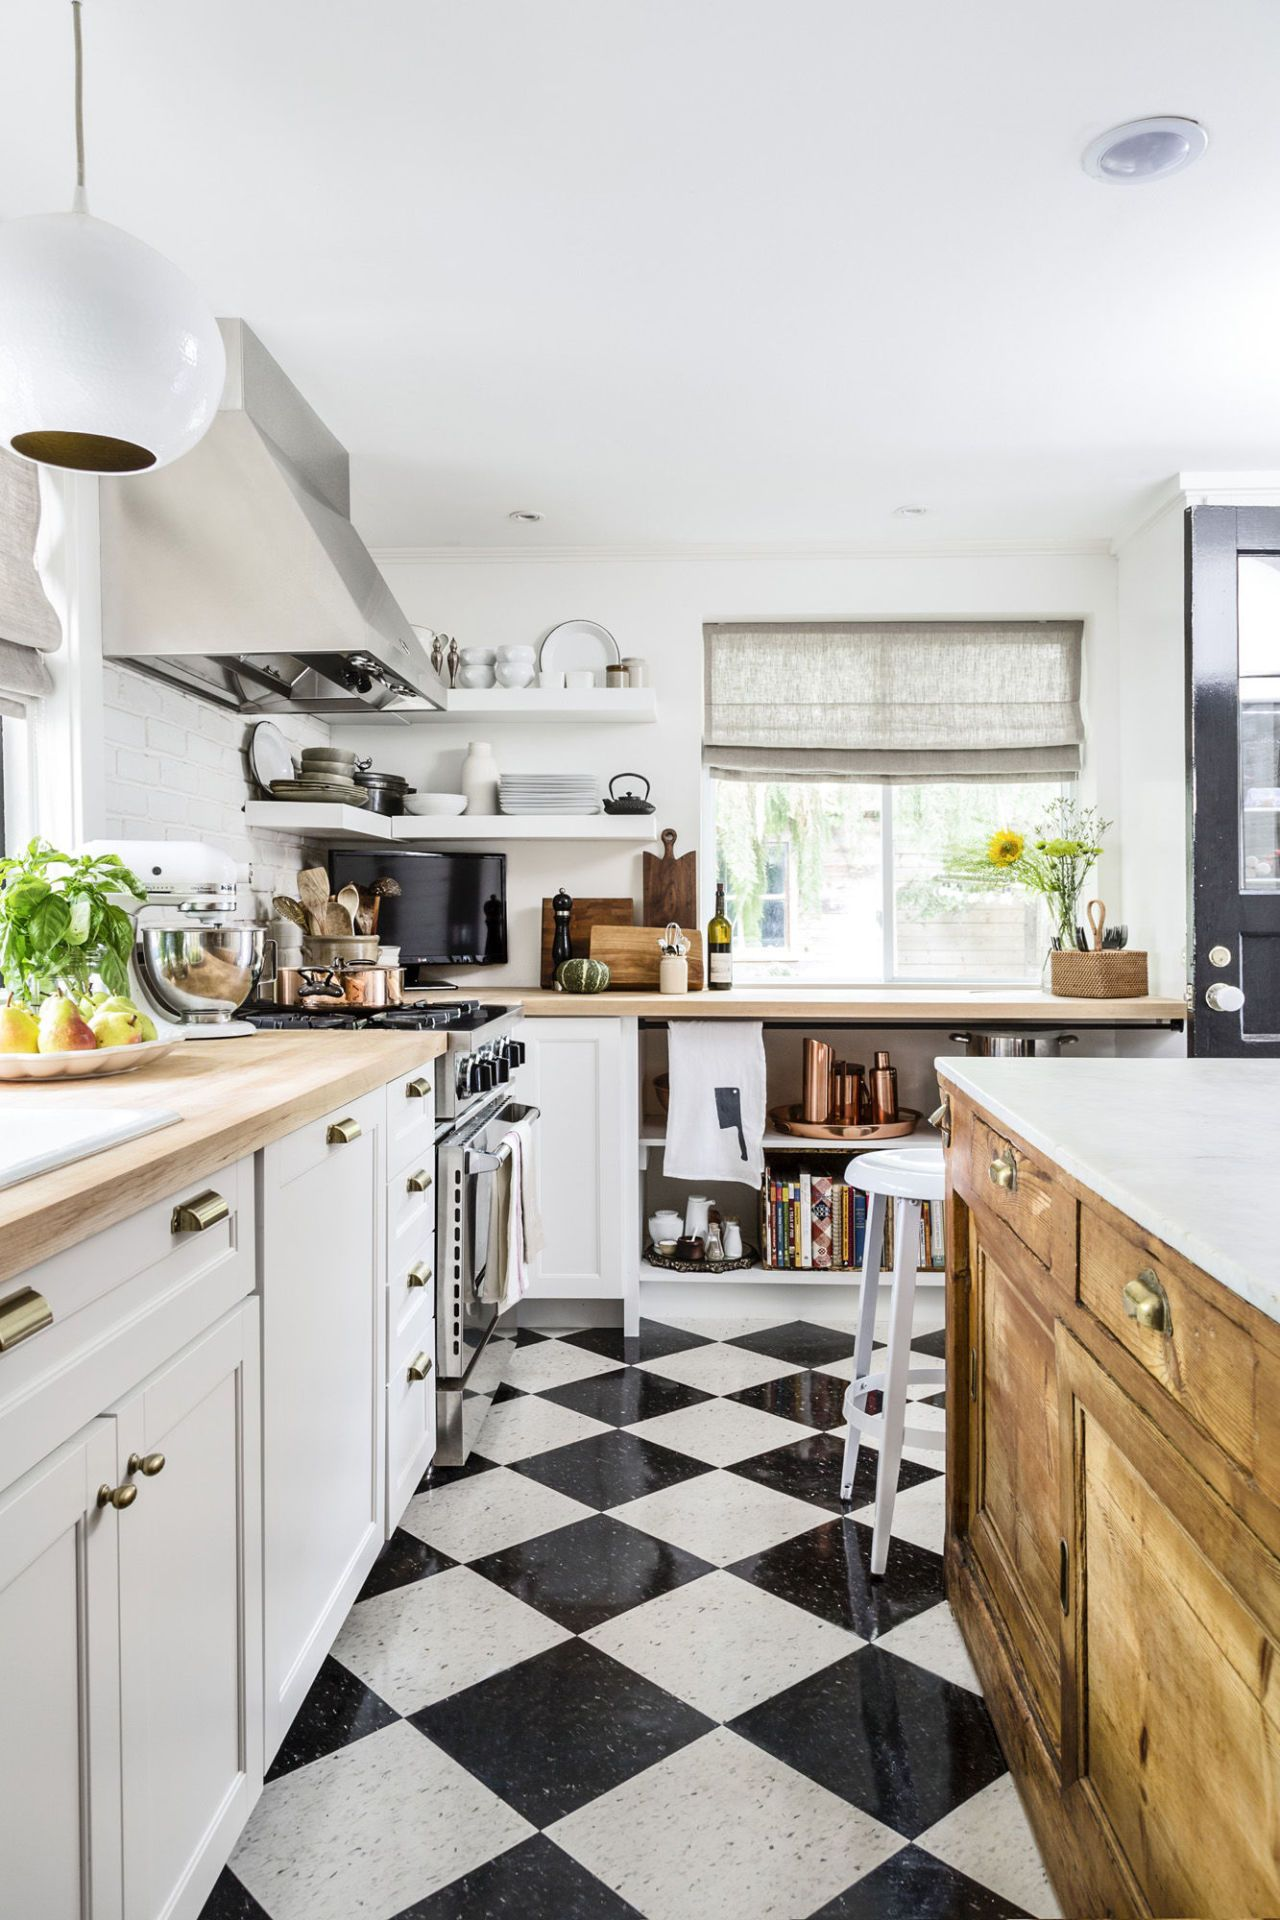 100+ Inspiring Kitchen Decorating Ideas   White flooring, Kitchens ...